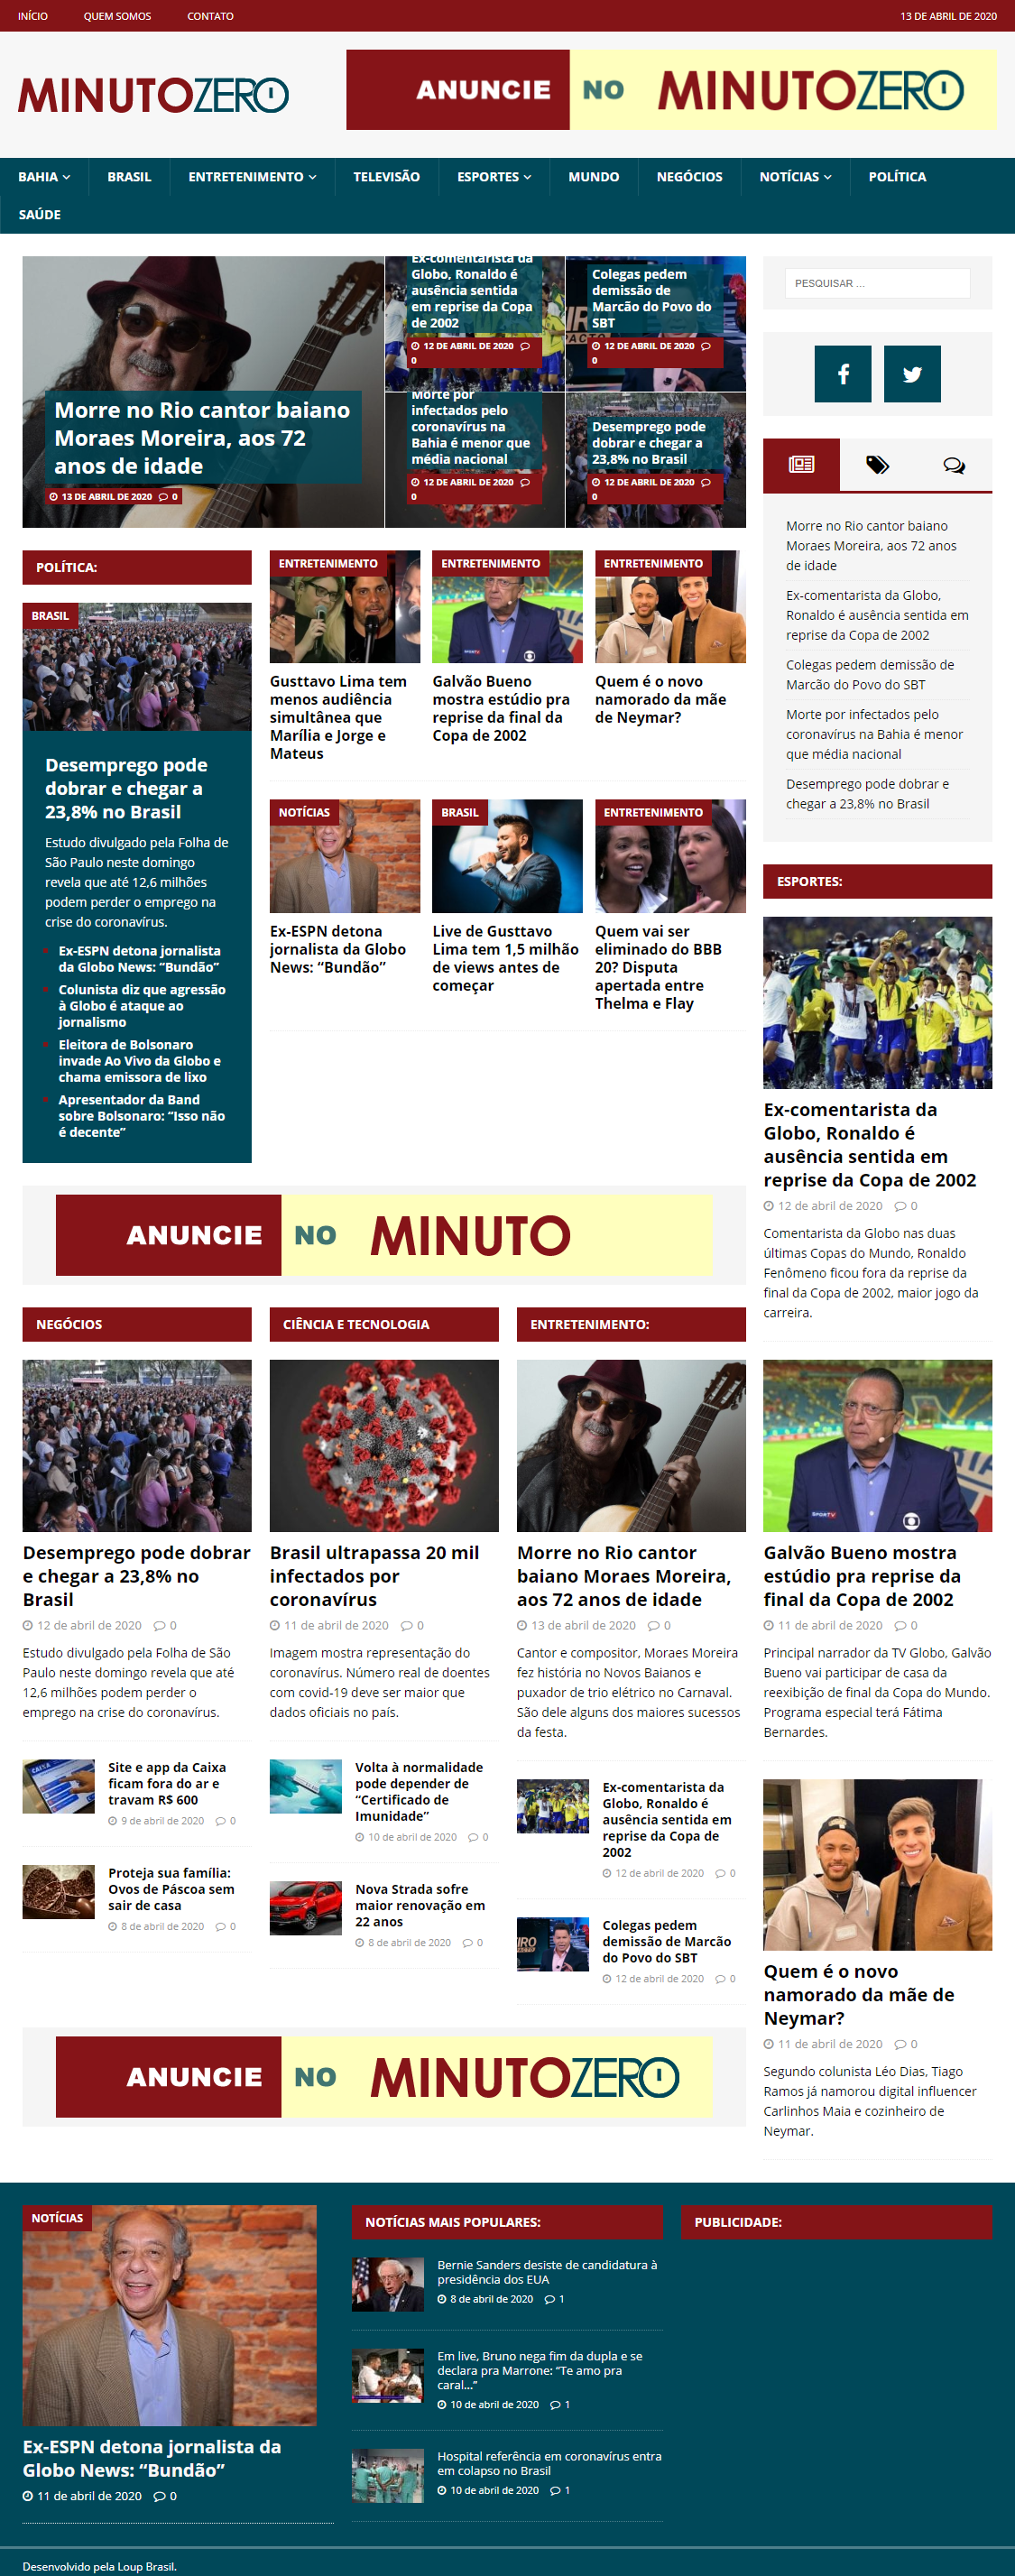 print-minutozero-paginaprincipal